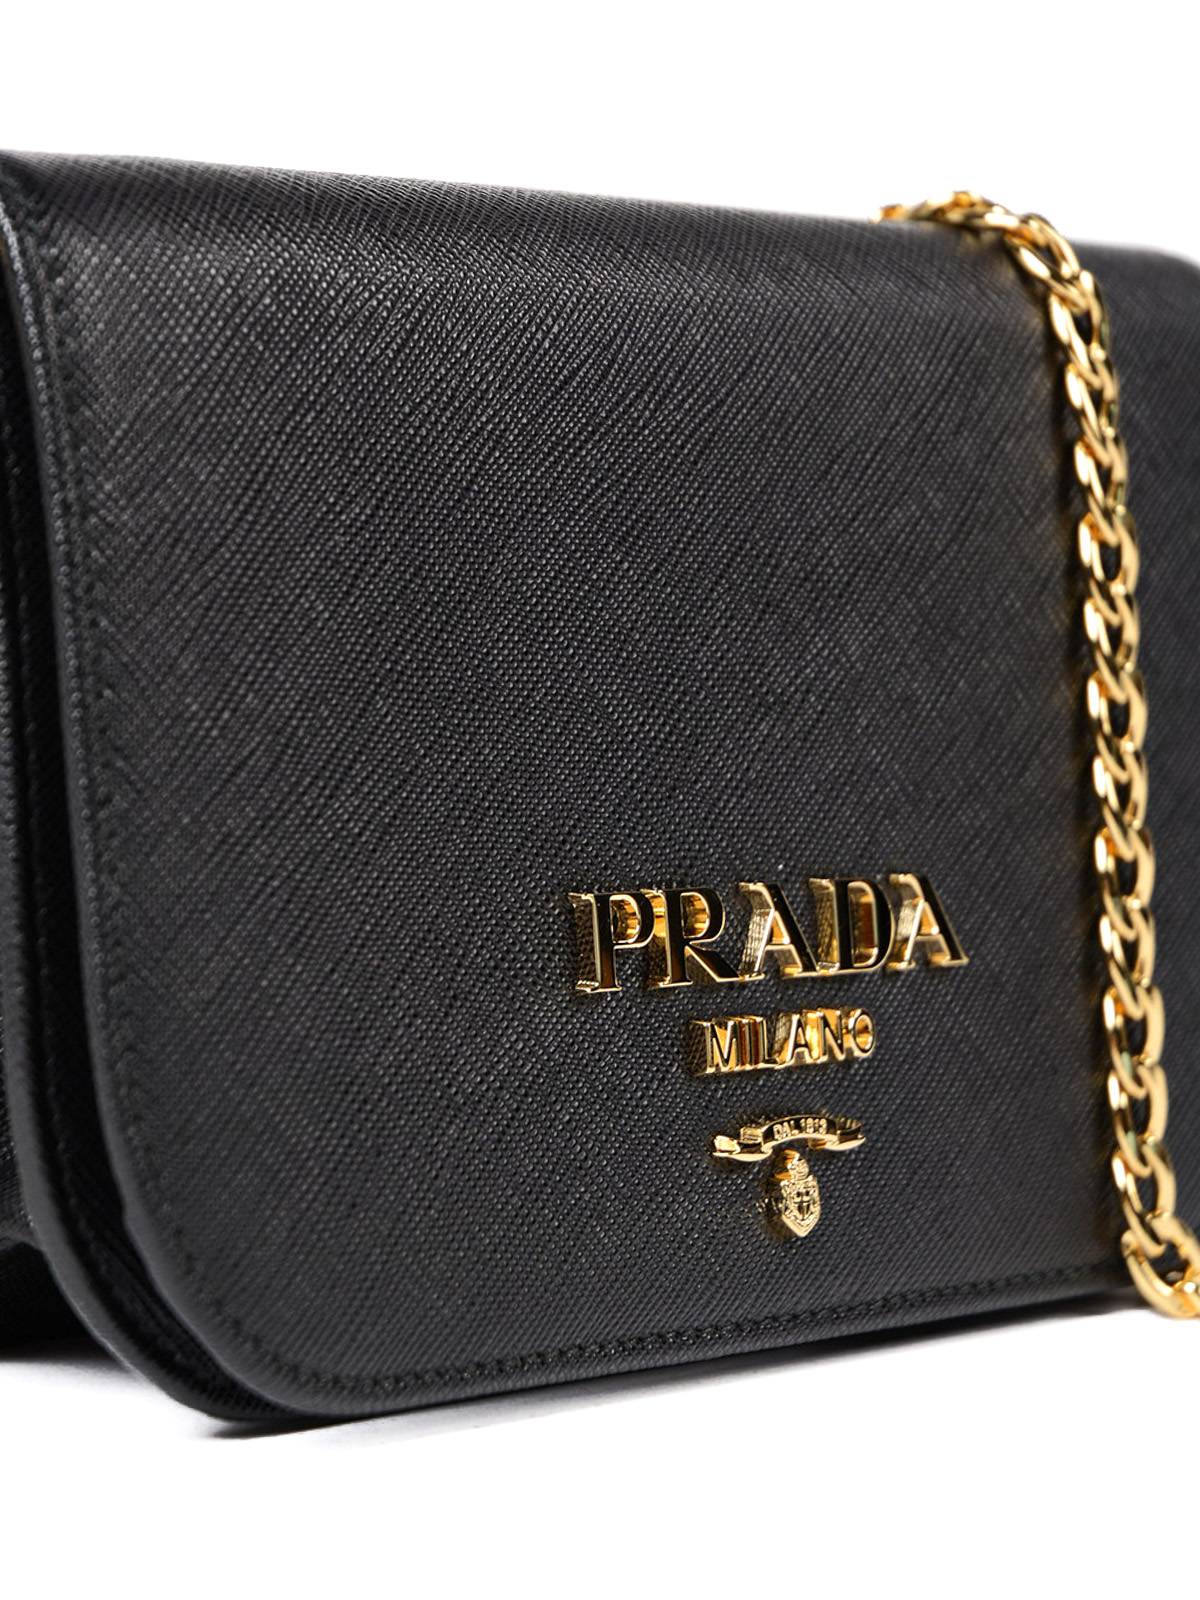 61965a5f2afe Prada - Saffiano leather small black bag - shoulder bags - 1BH019NZV002